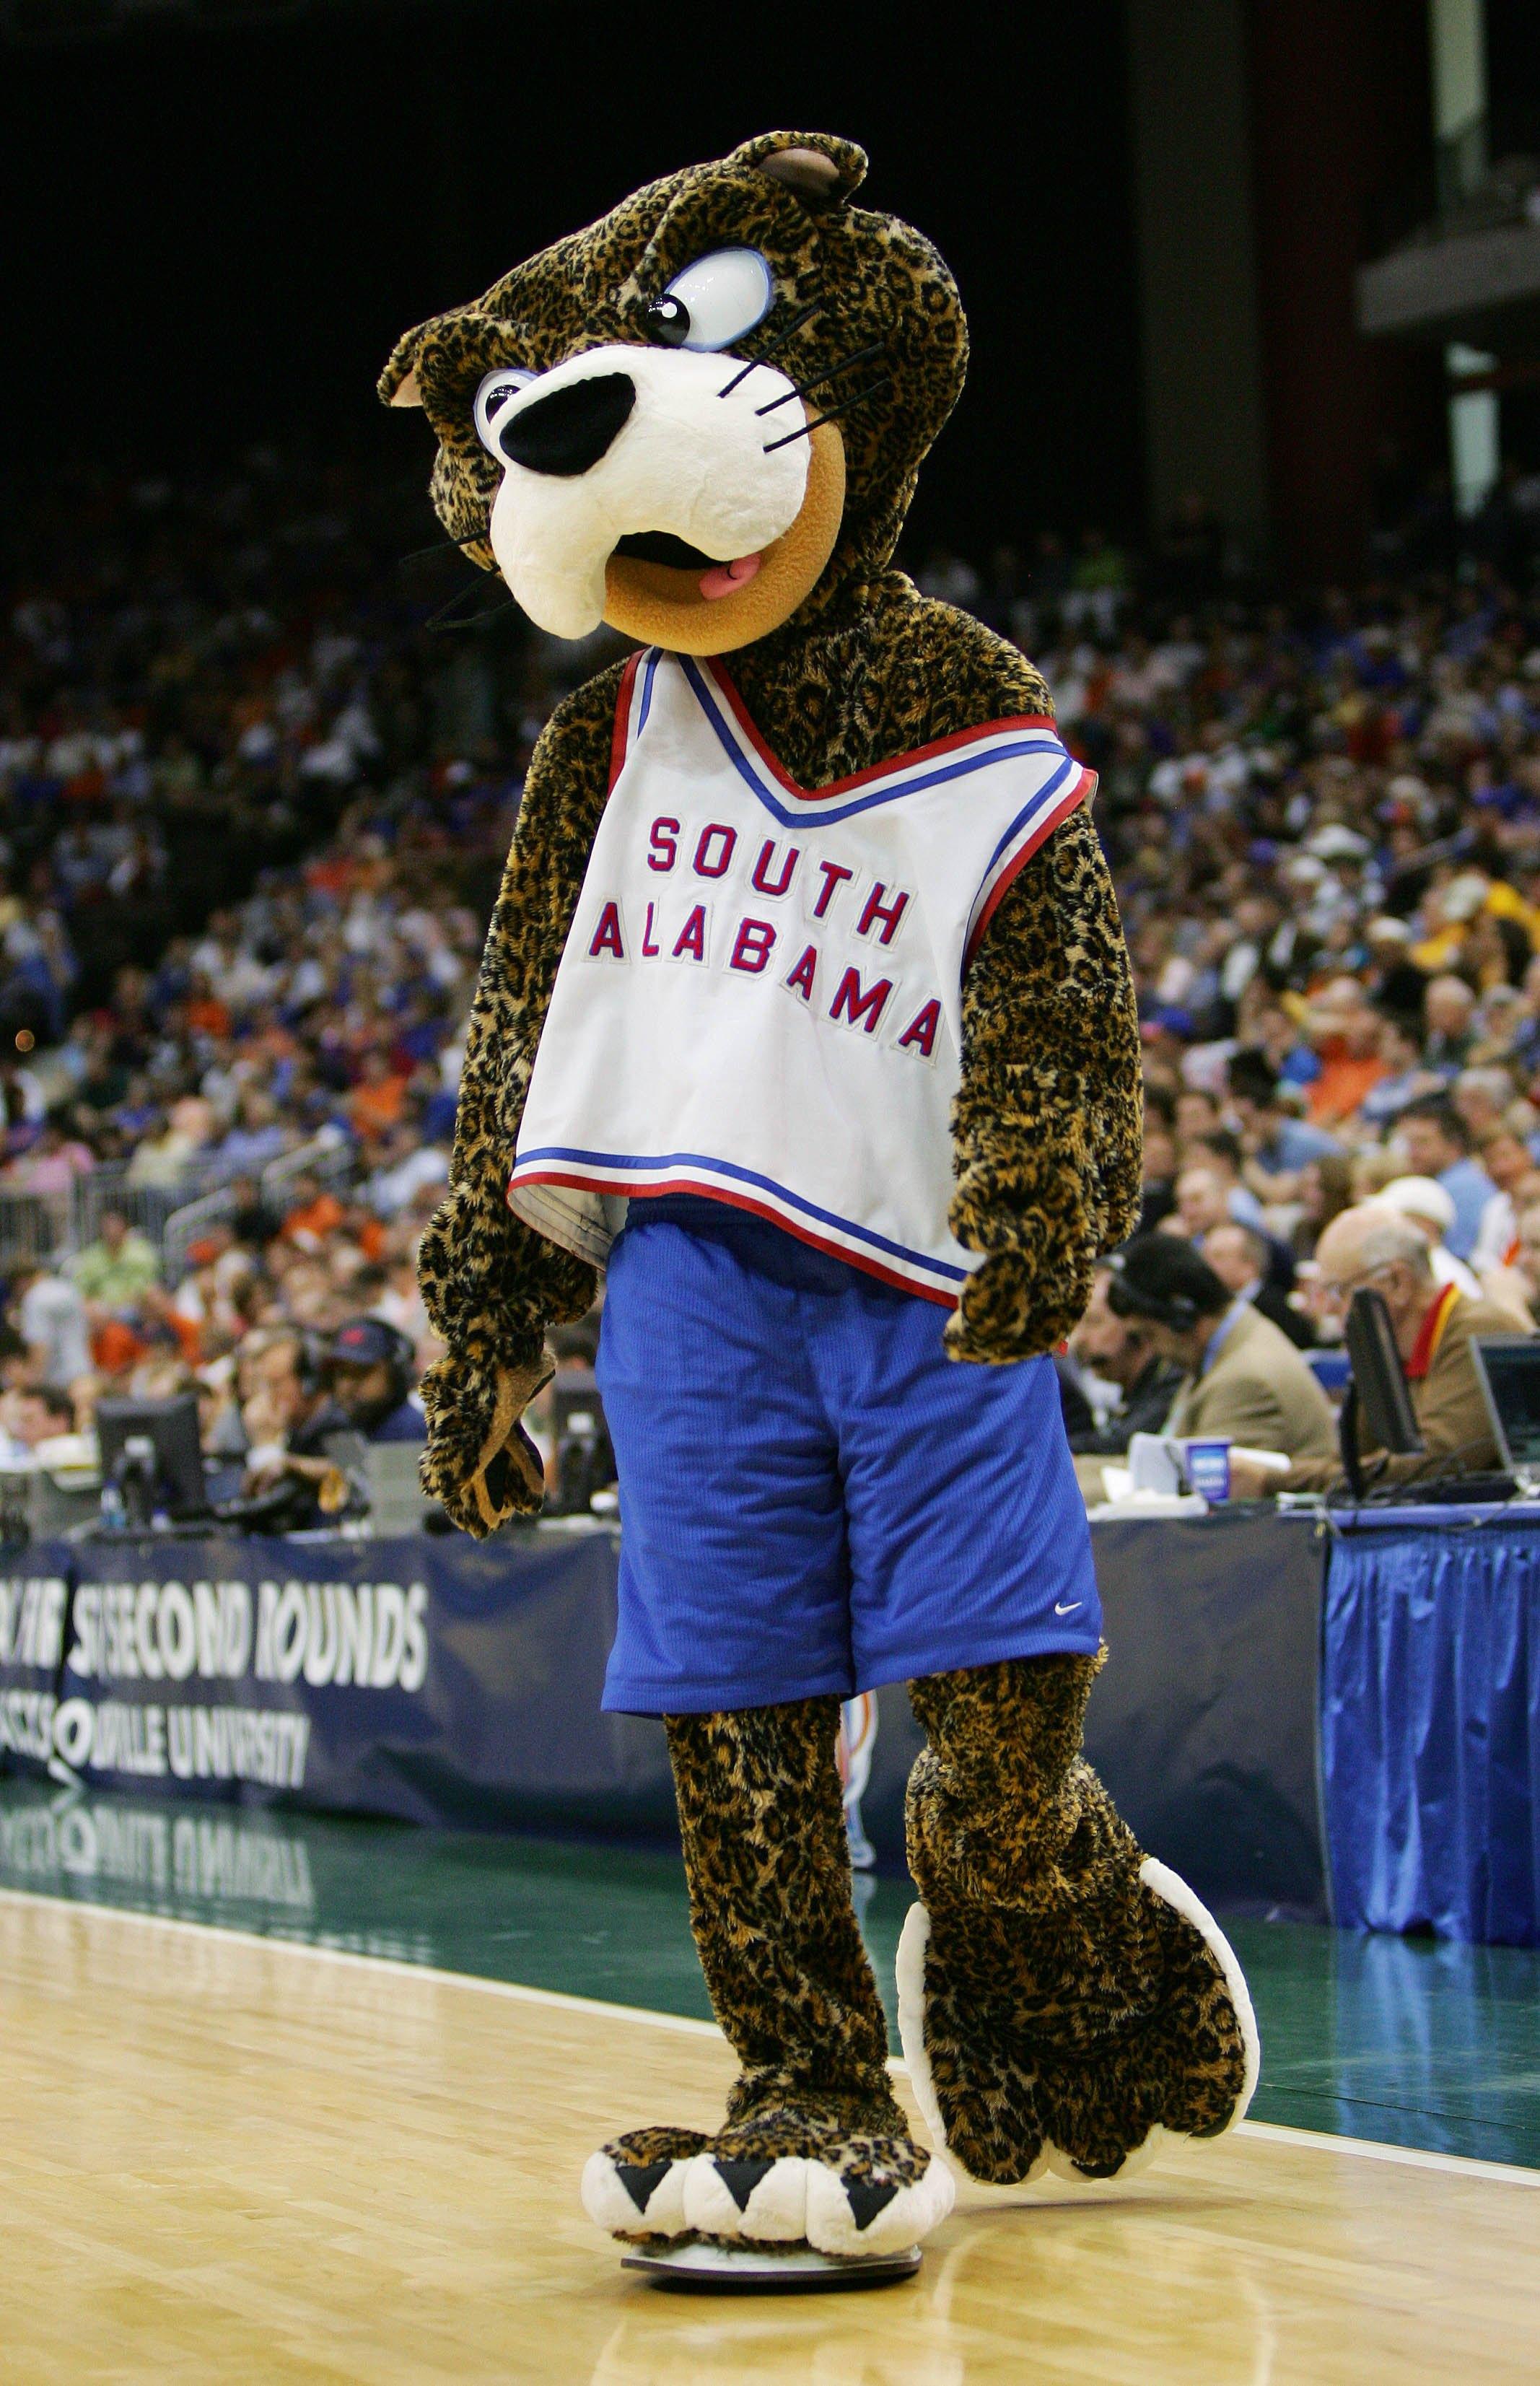 South Alabama's Mascot is strange.